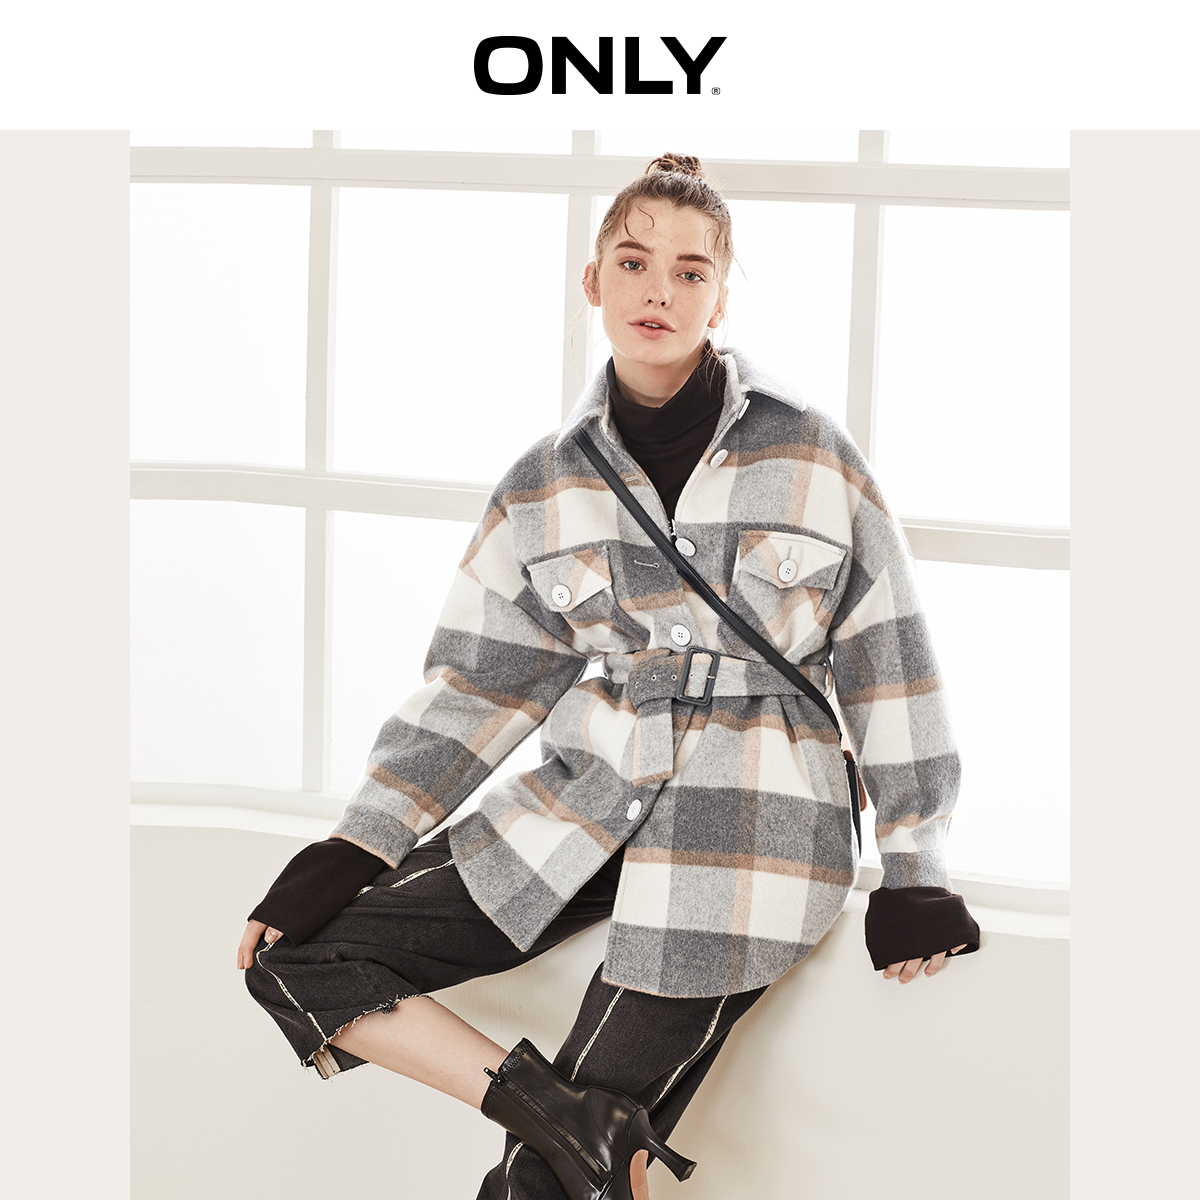 ONLY  Autumn Winter Women's Checked Woolen Coat | 11936T519